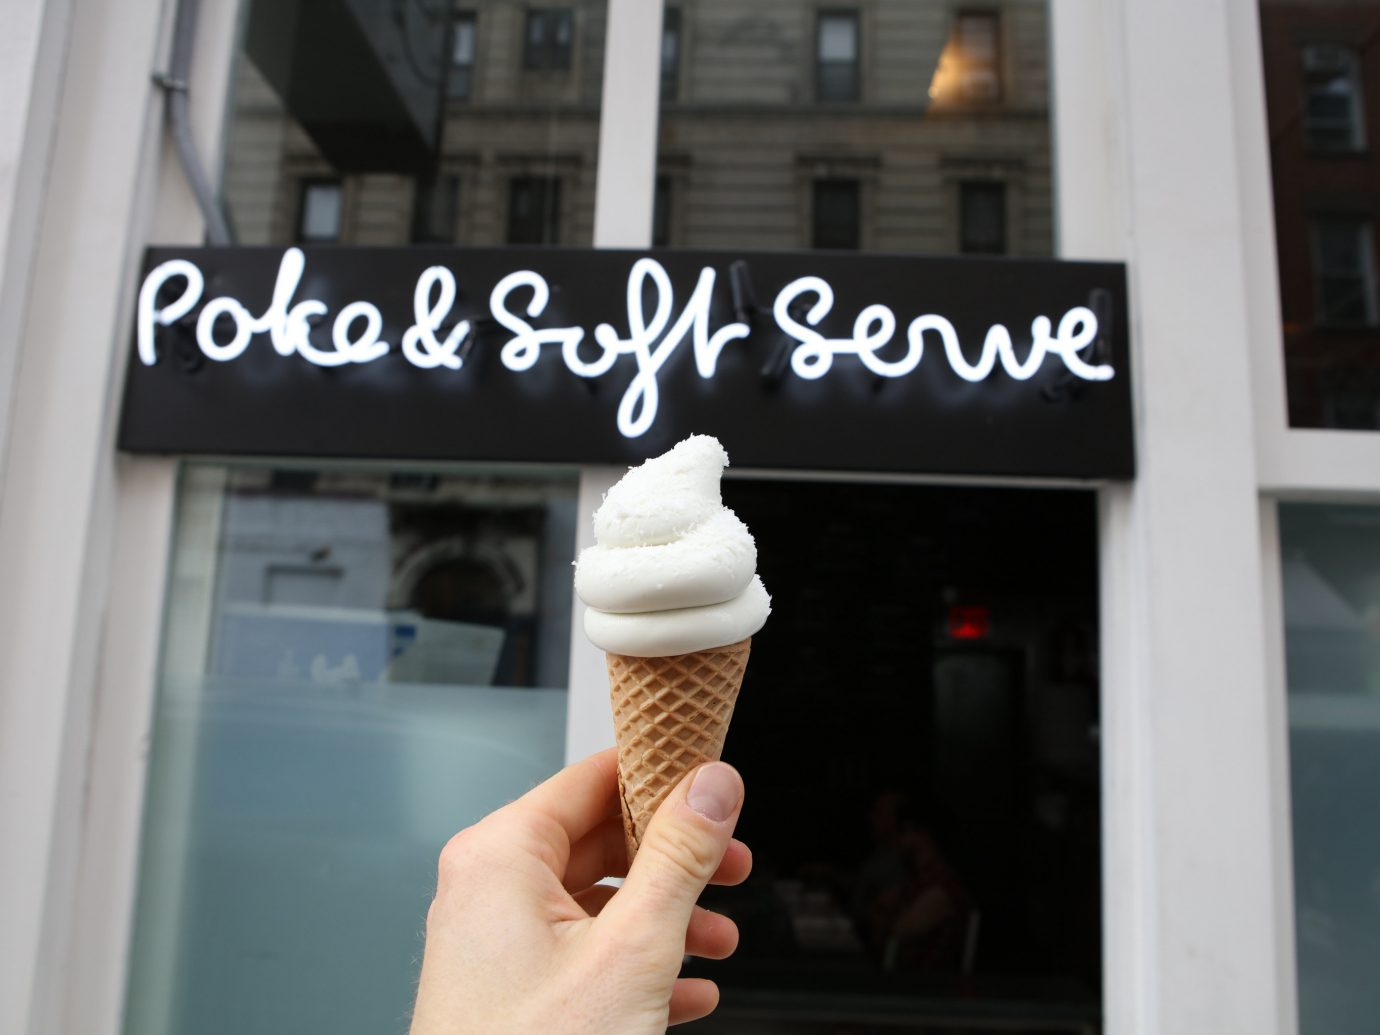 Food + Drink building outdoor person white food dessert sense hand interior design window